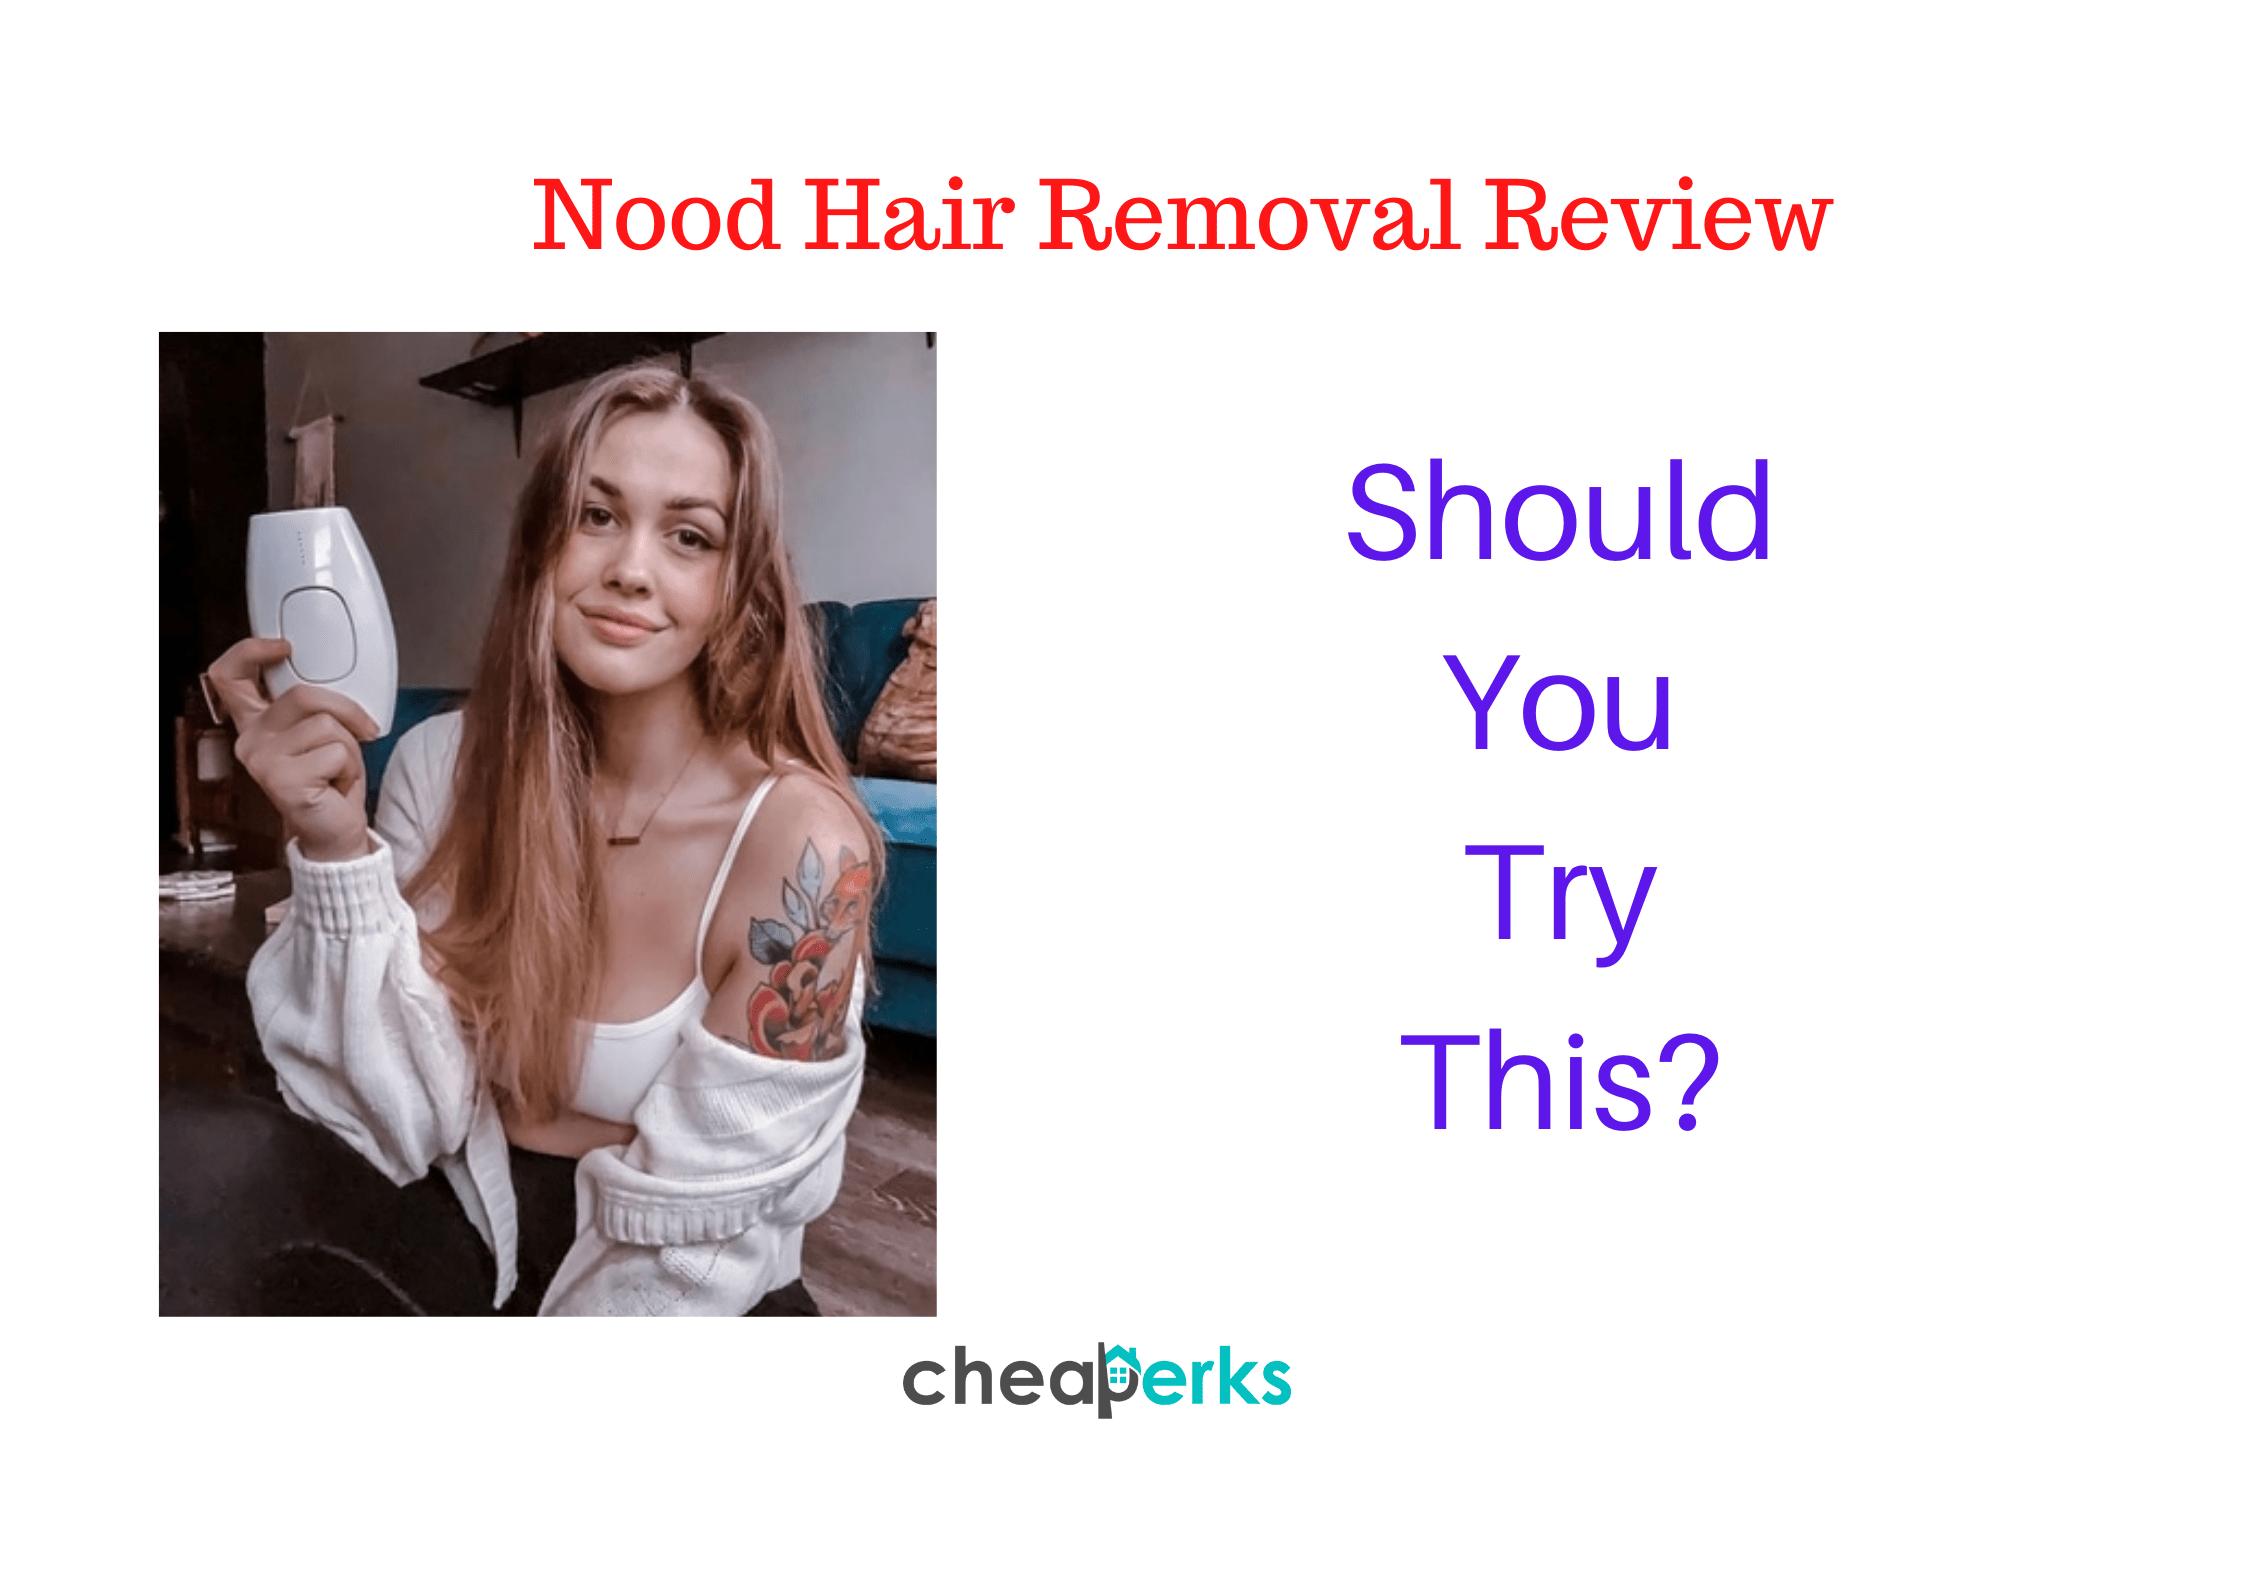 Nood Hair Removal Reviews